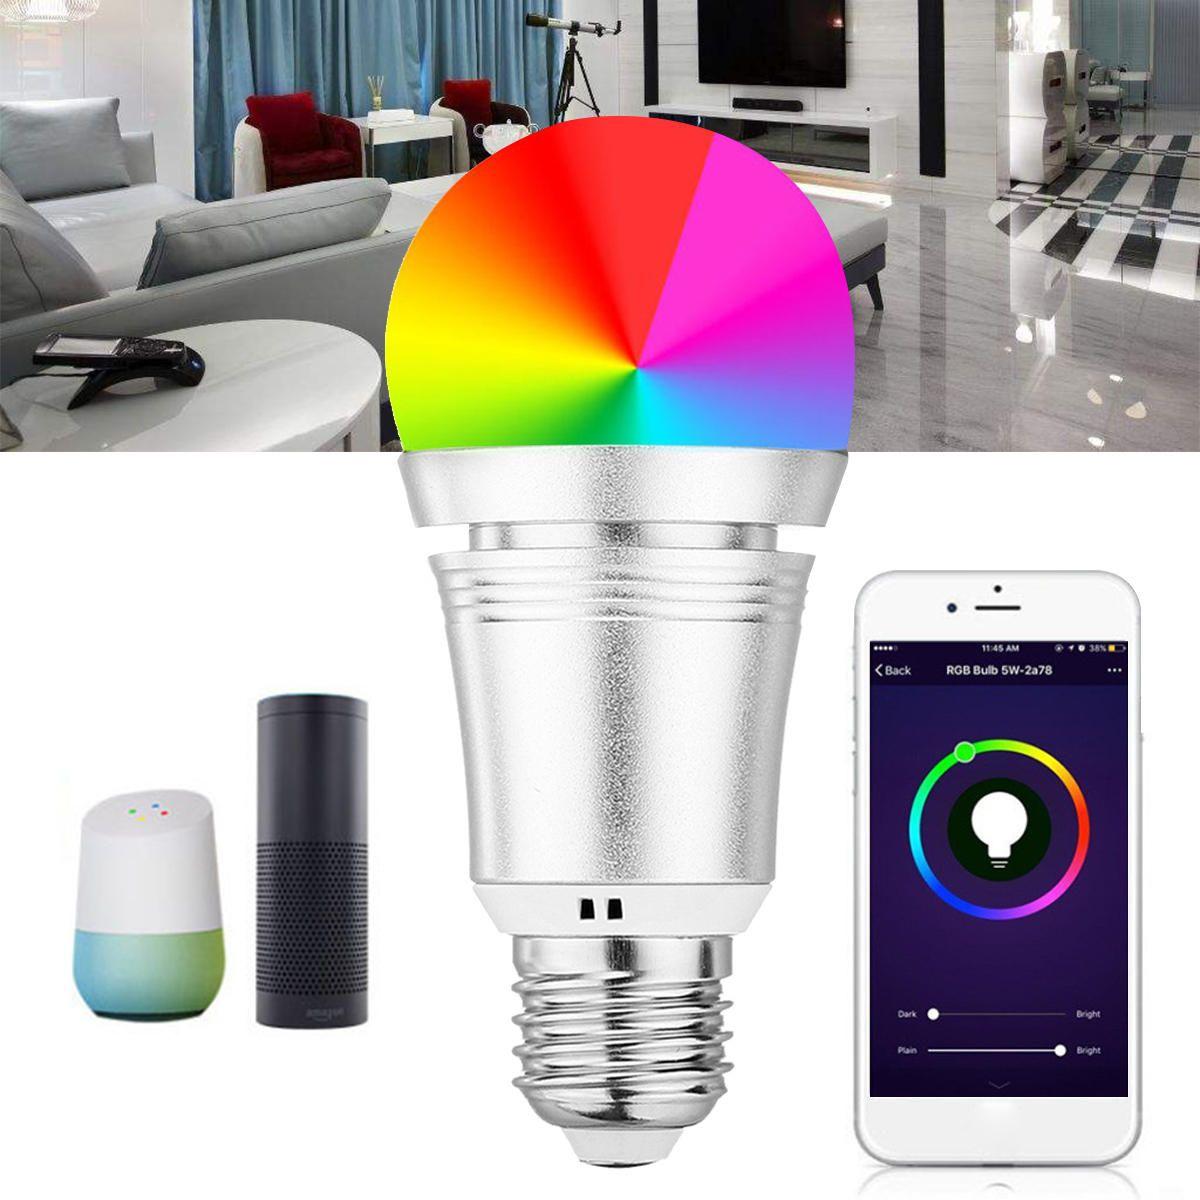 Us 13 99 7w E27 Wifi Led Rgb Light Smart Bulb App Remote Control